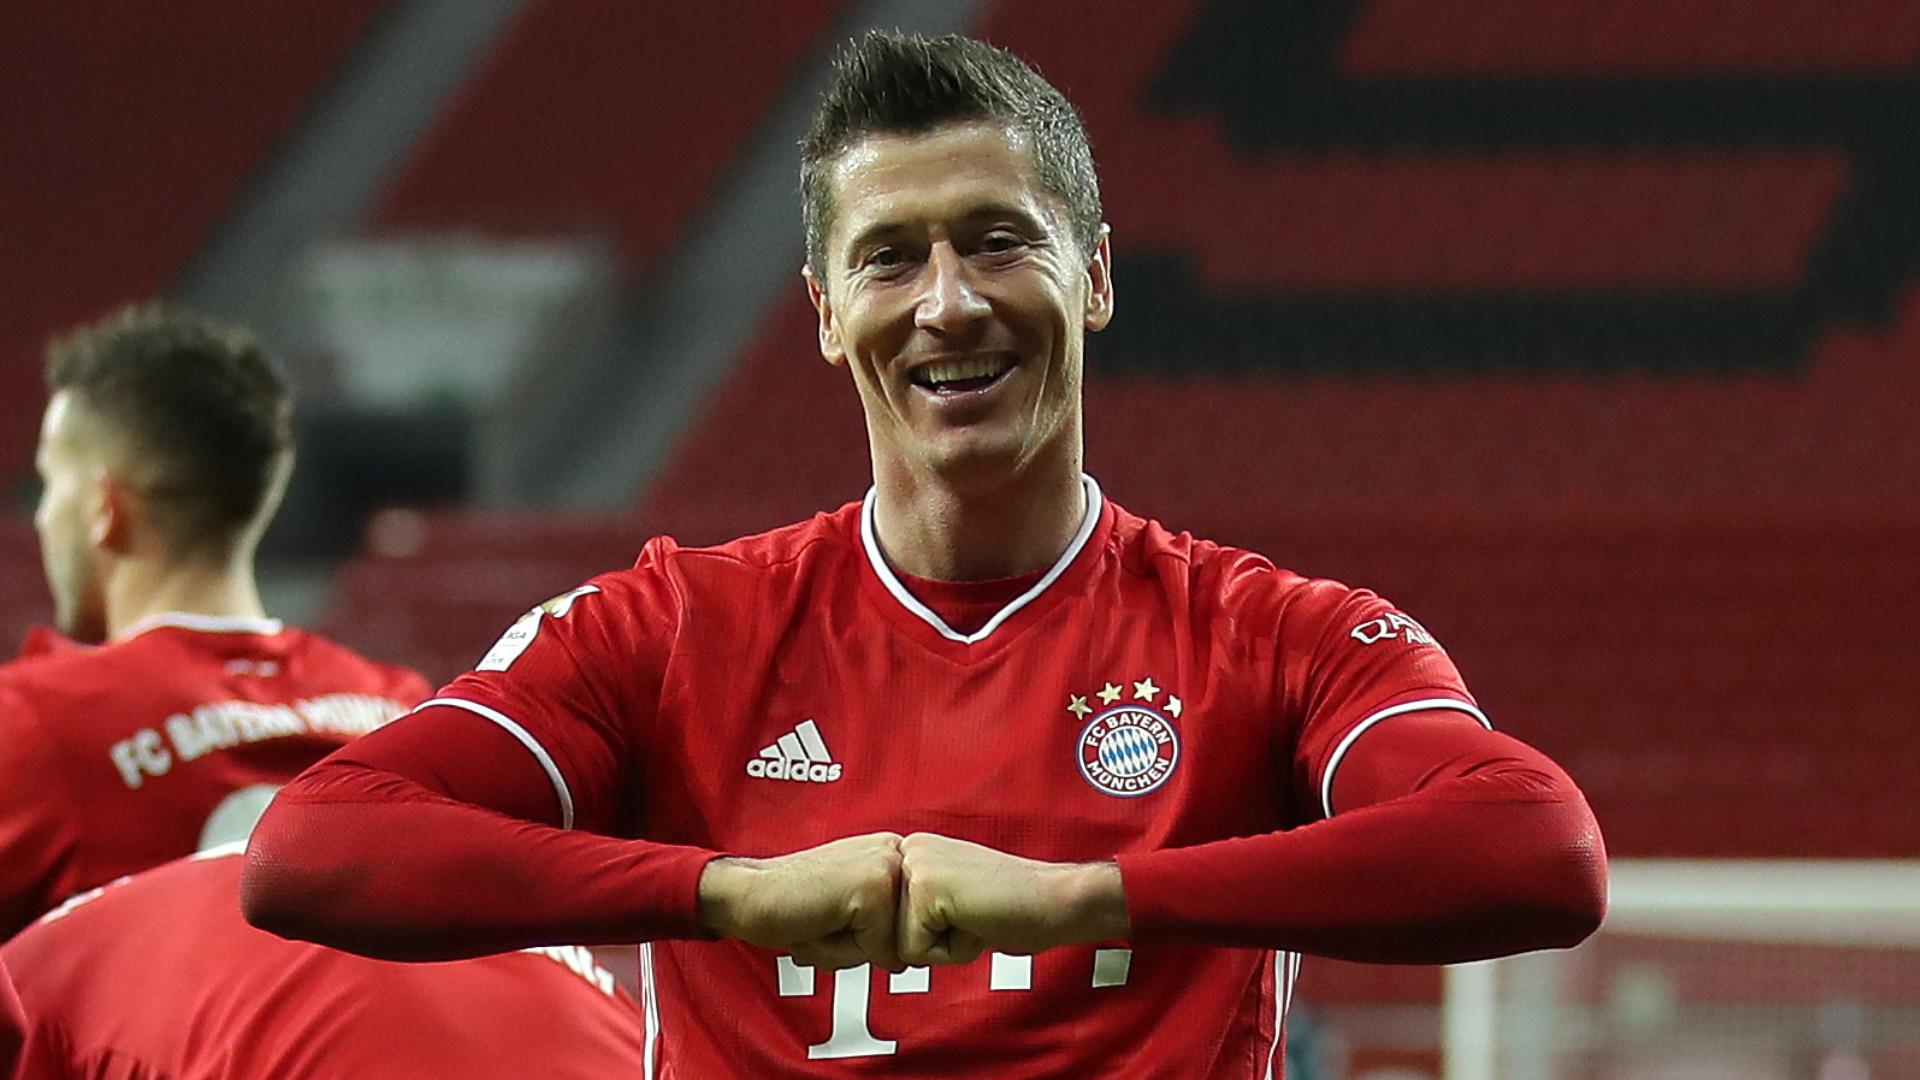 Lewandowski Klopp Was A U0026 39 Bad Teacher U0026 39 To Me At Dortmund